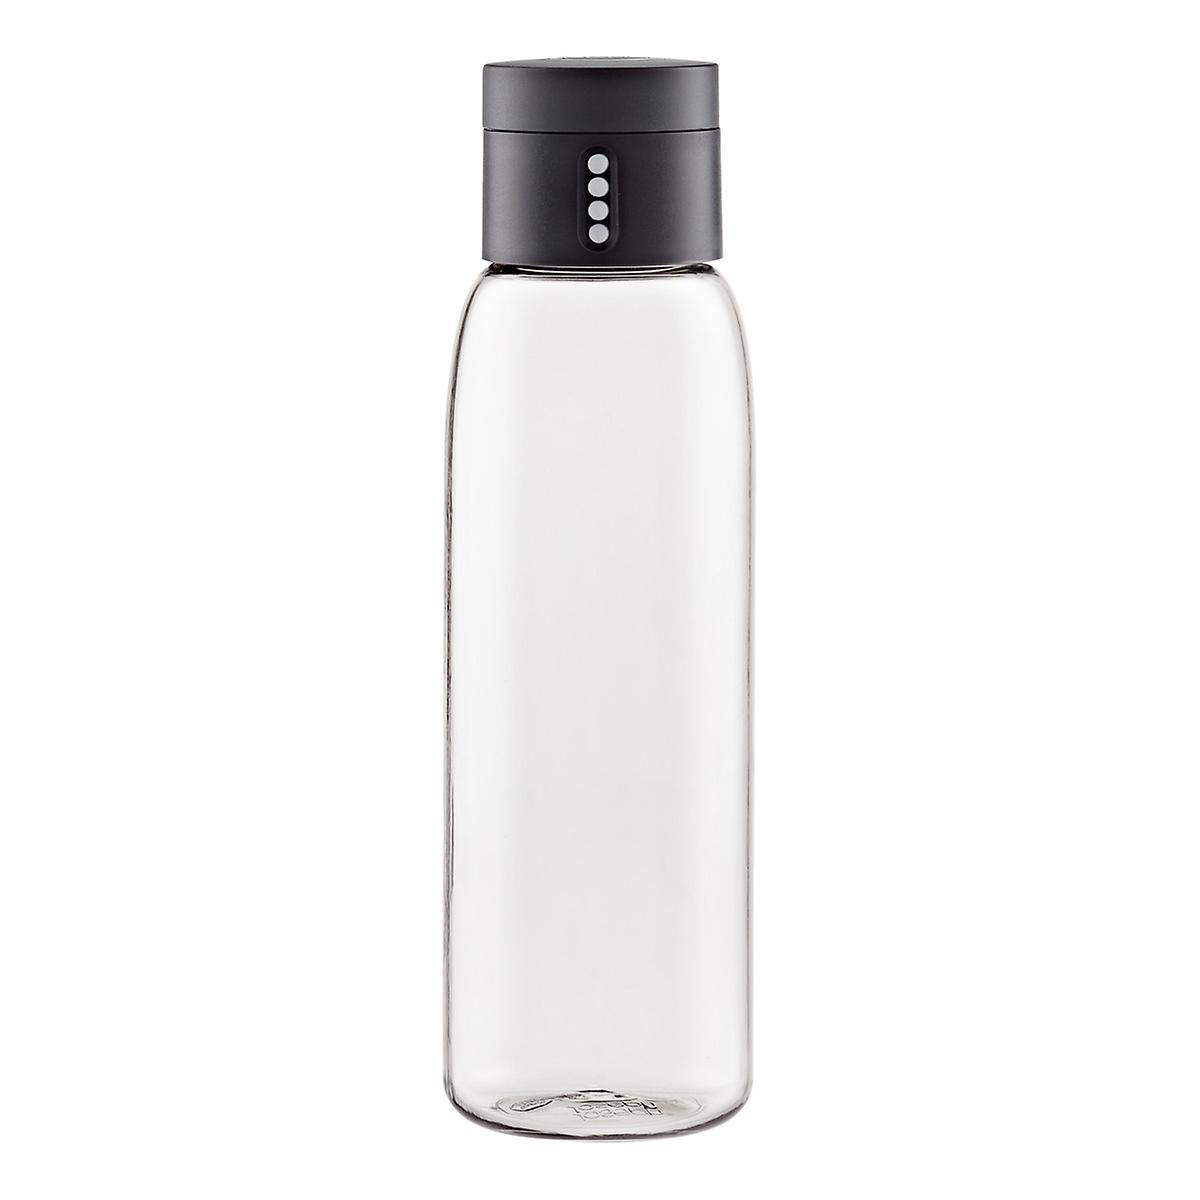 Joseph Joseph Dot Water Bottle The Container Store